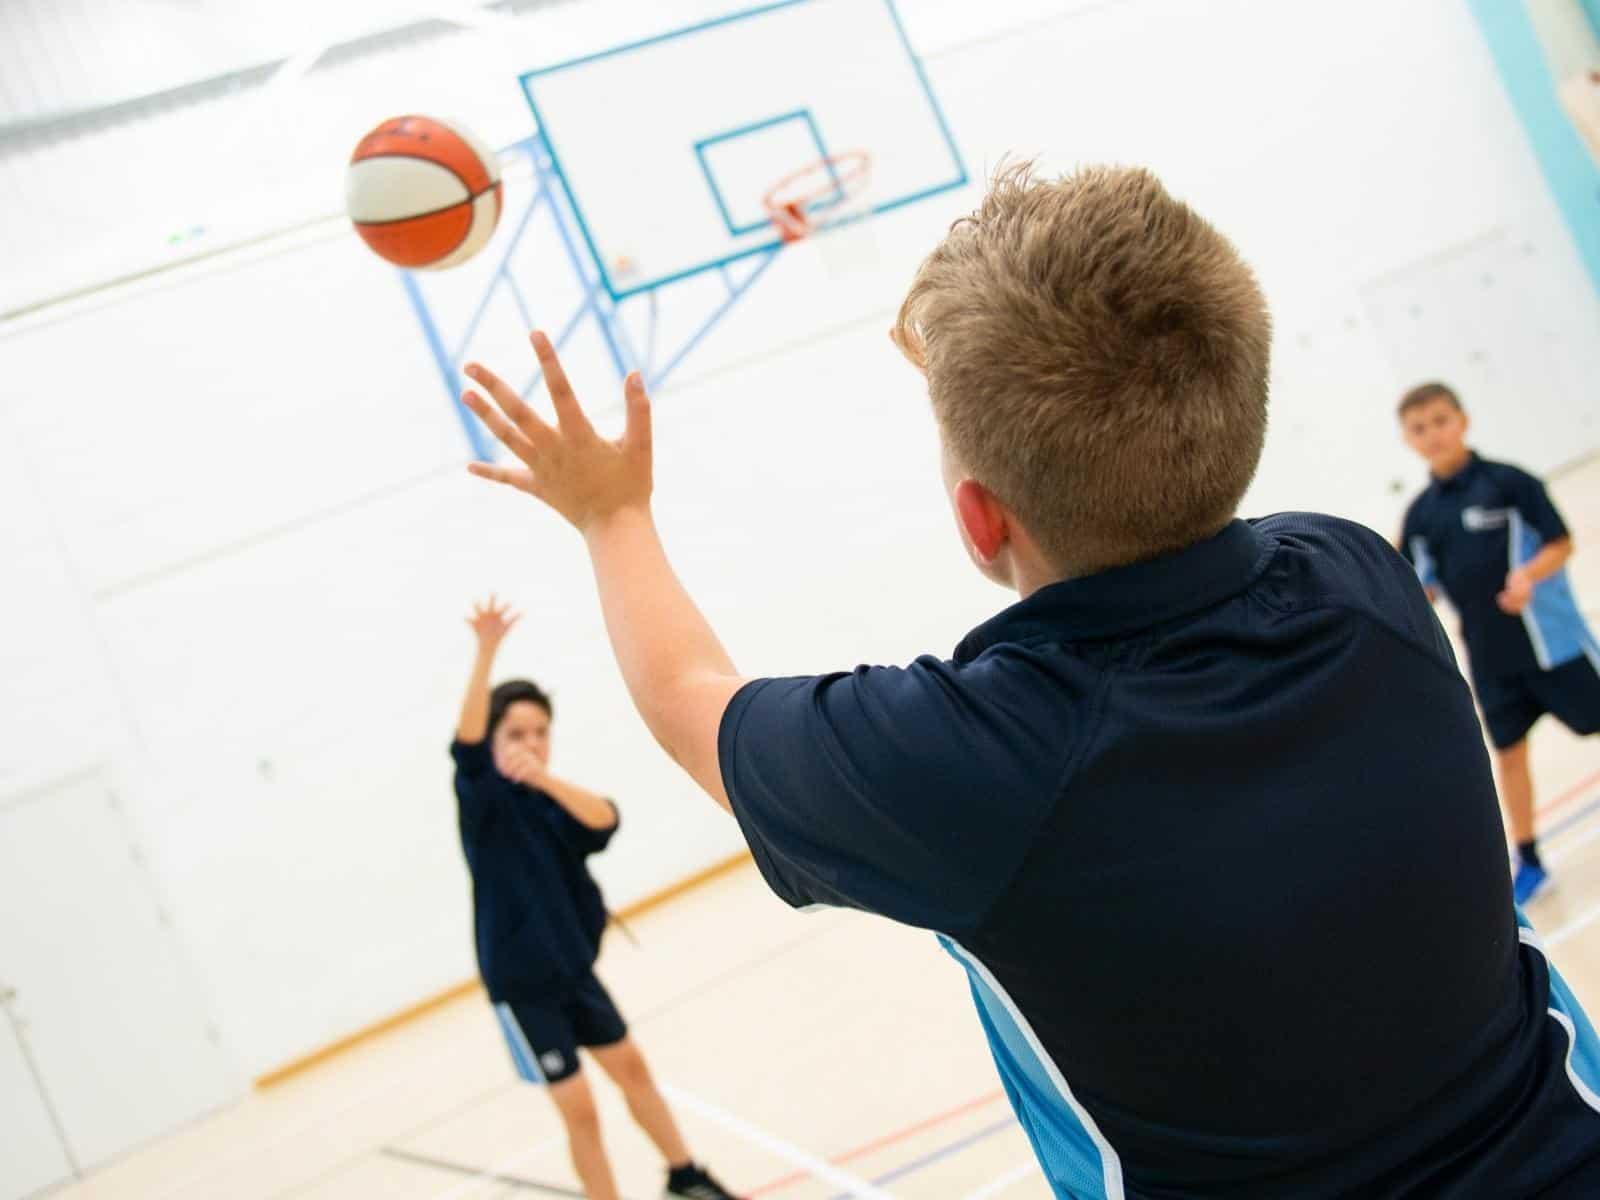 Children playing basketball at summer camp